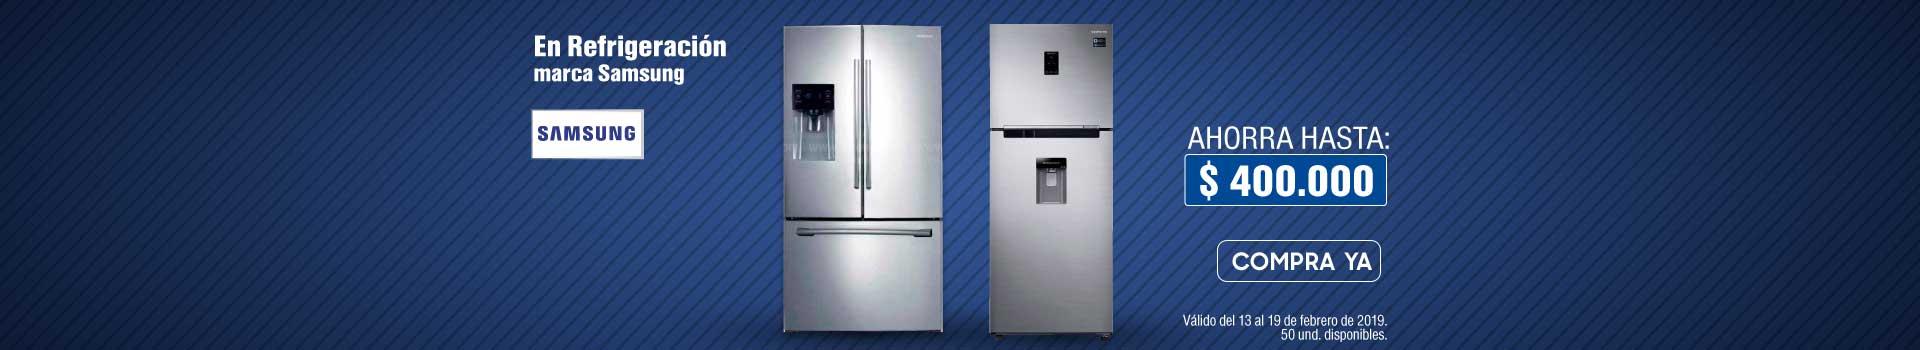 AK-KT-mayores-1-ELECT-BCAT-refrigeracion-120219